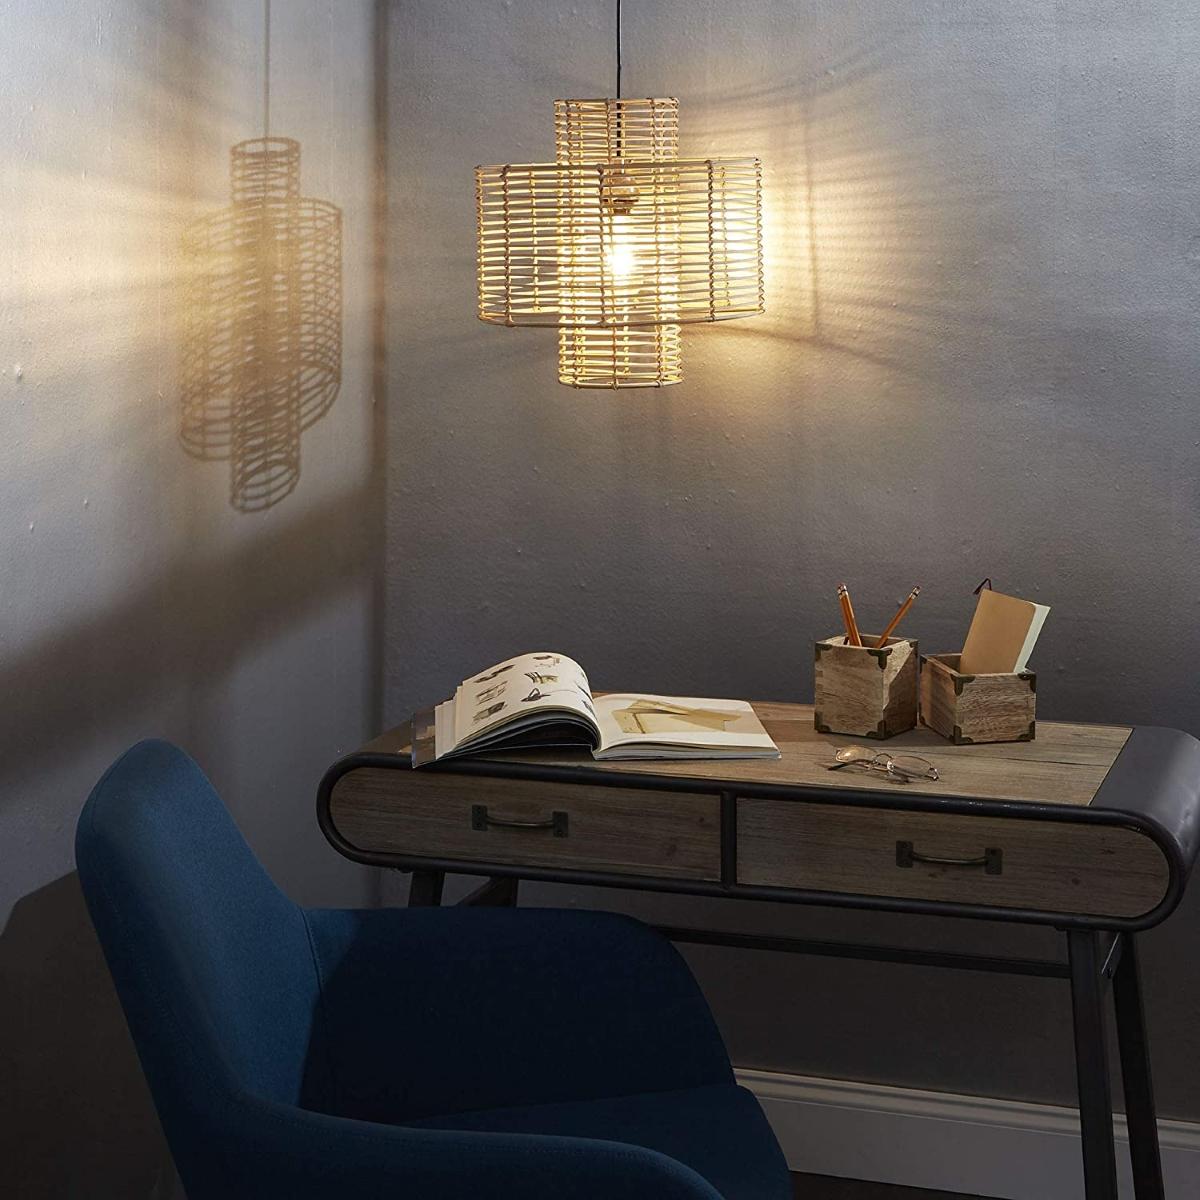 Transparent-rattan-pendant-light-shades